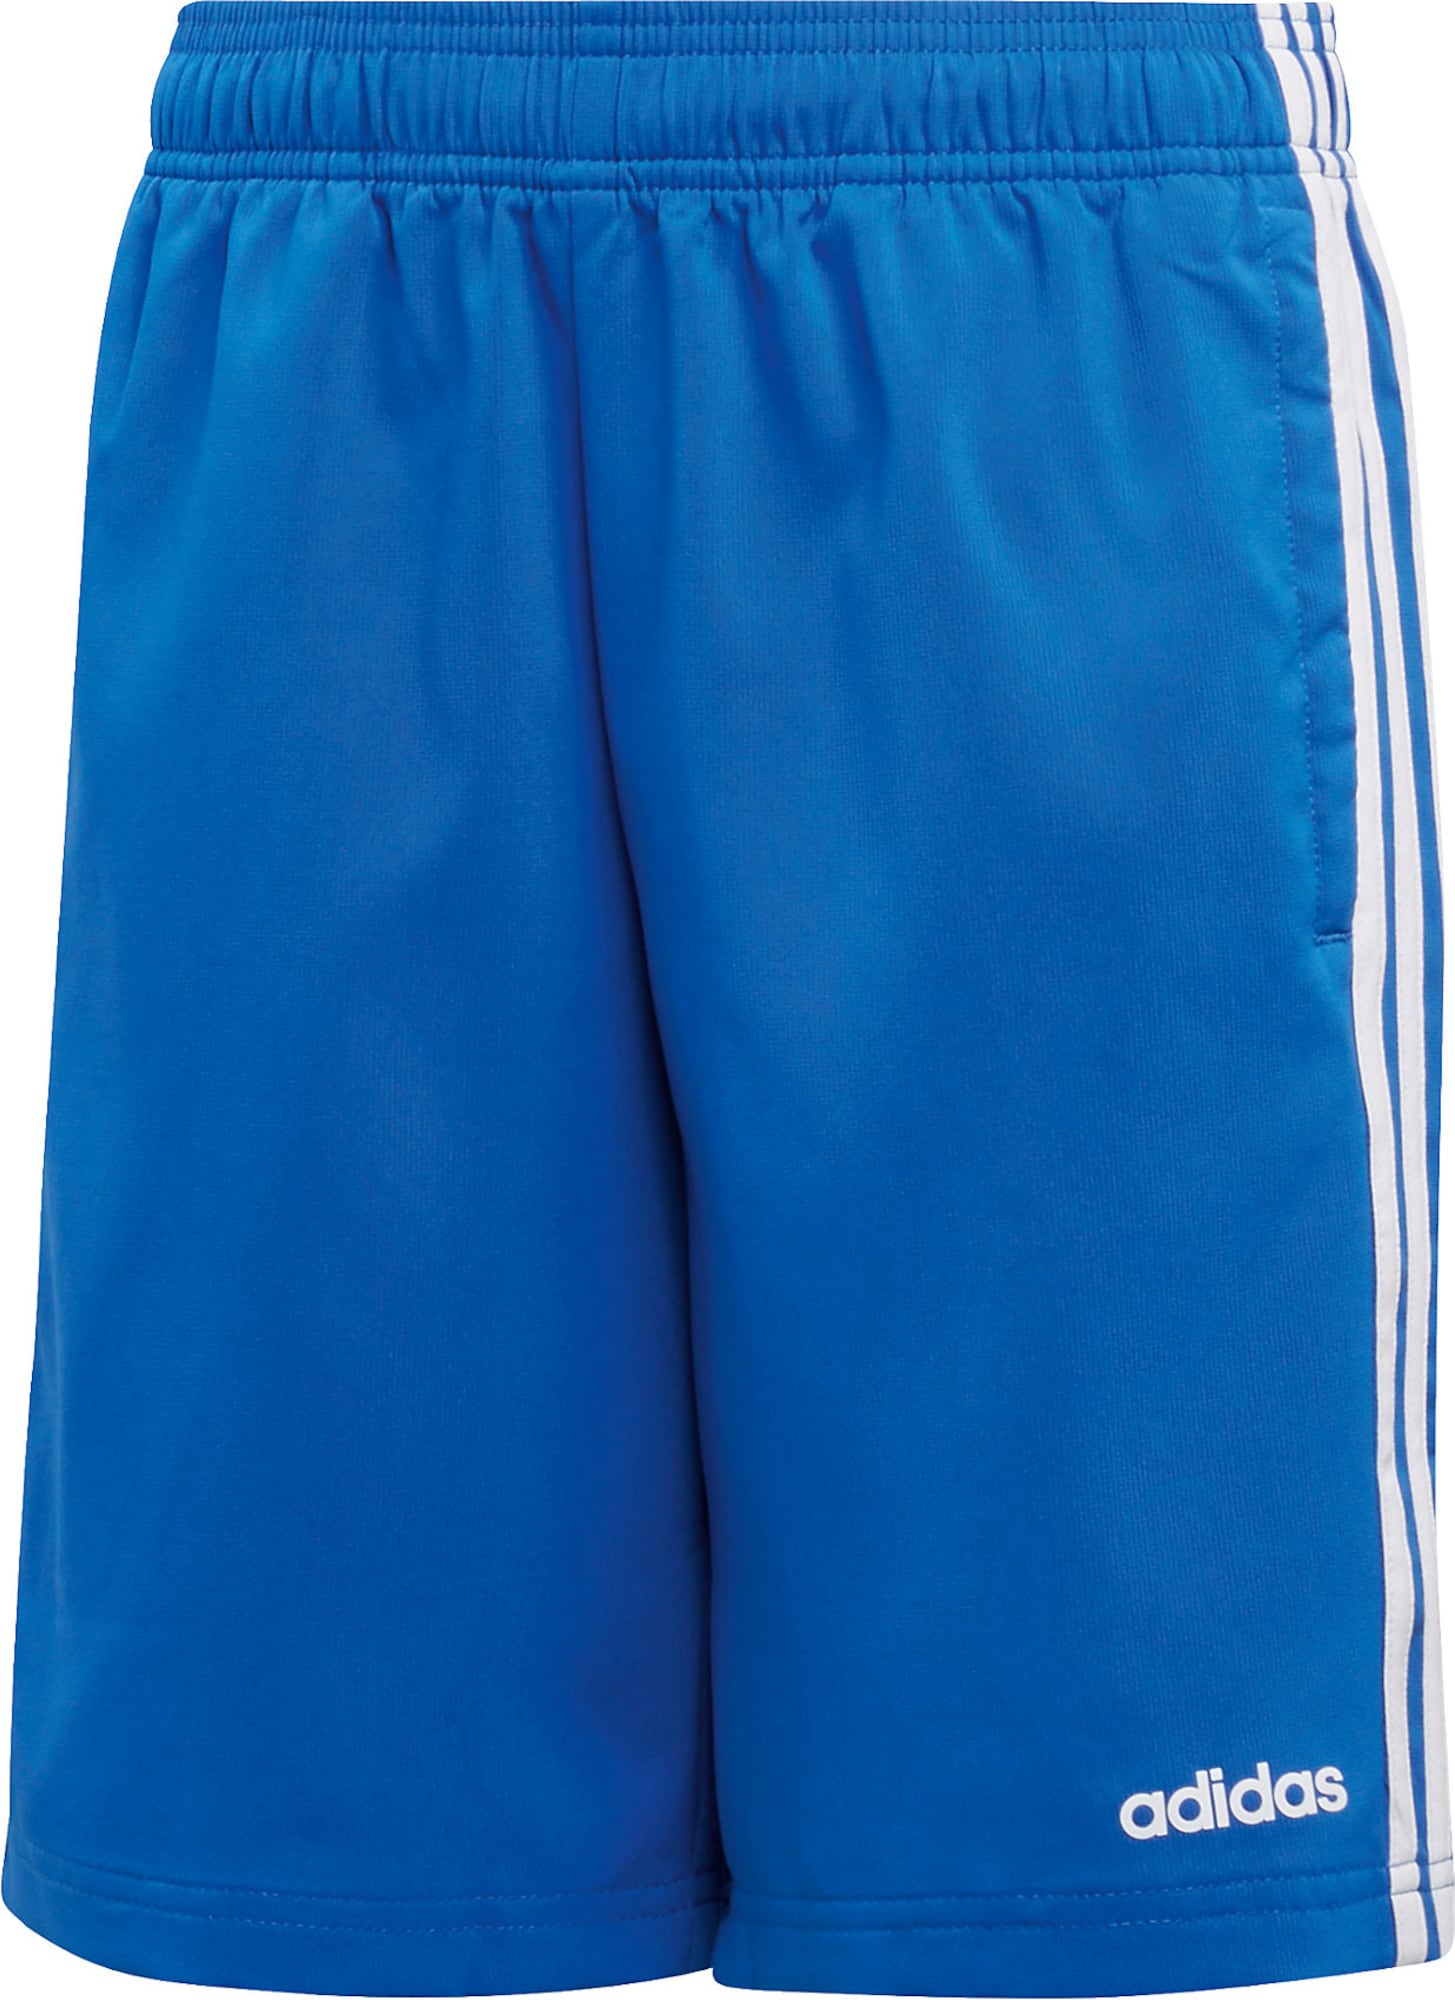 "ADIDAS PERFORMANCE Sportinės kelnės 'E 3S WV SH' sodri mėlyna (""karališka"") / balta"